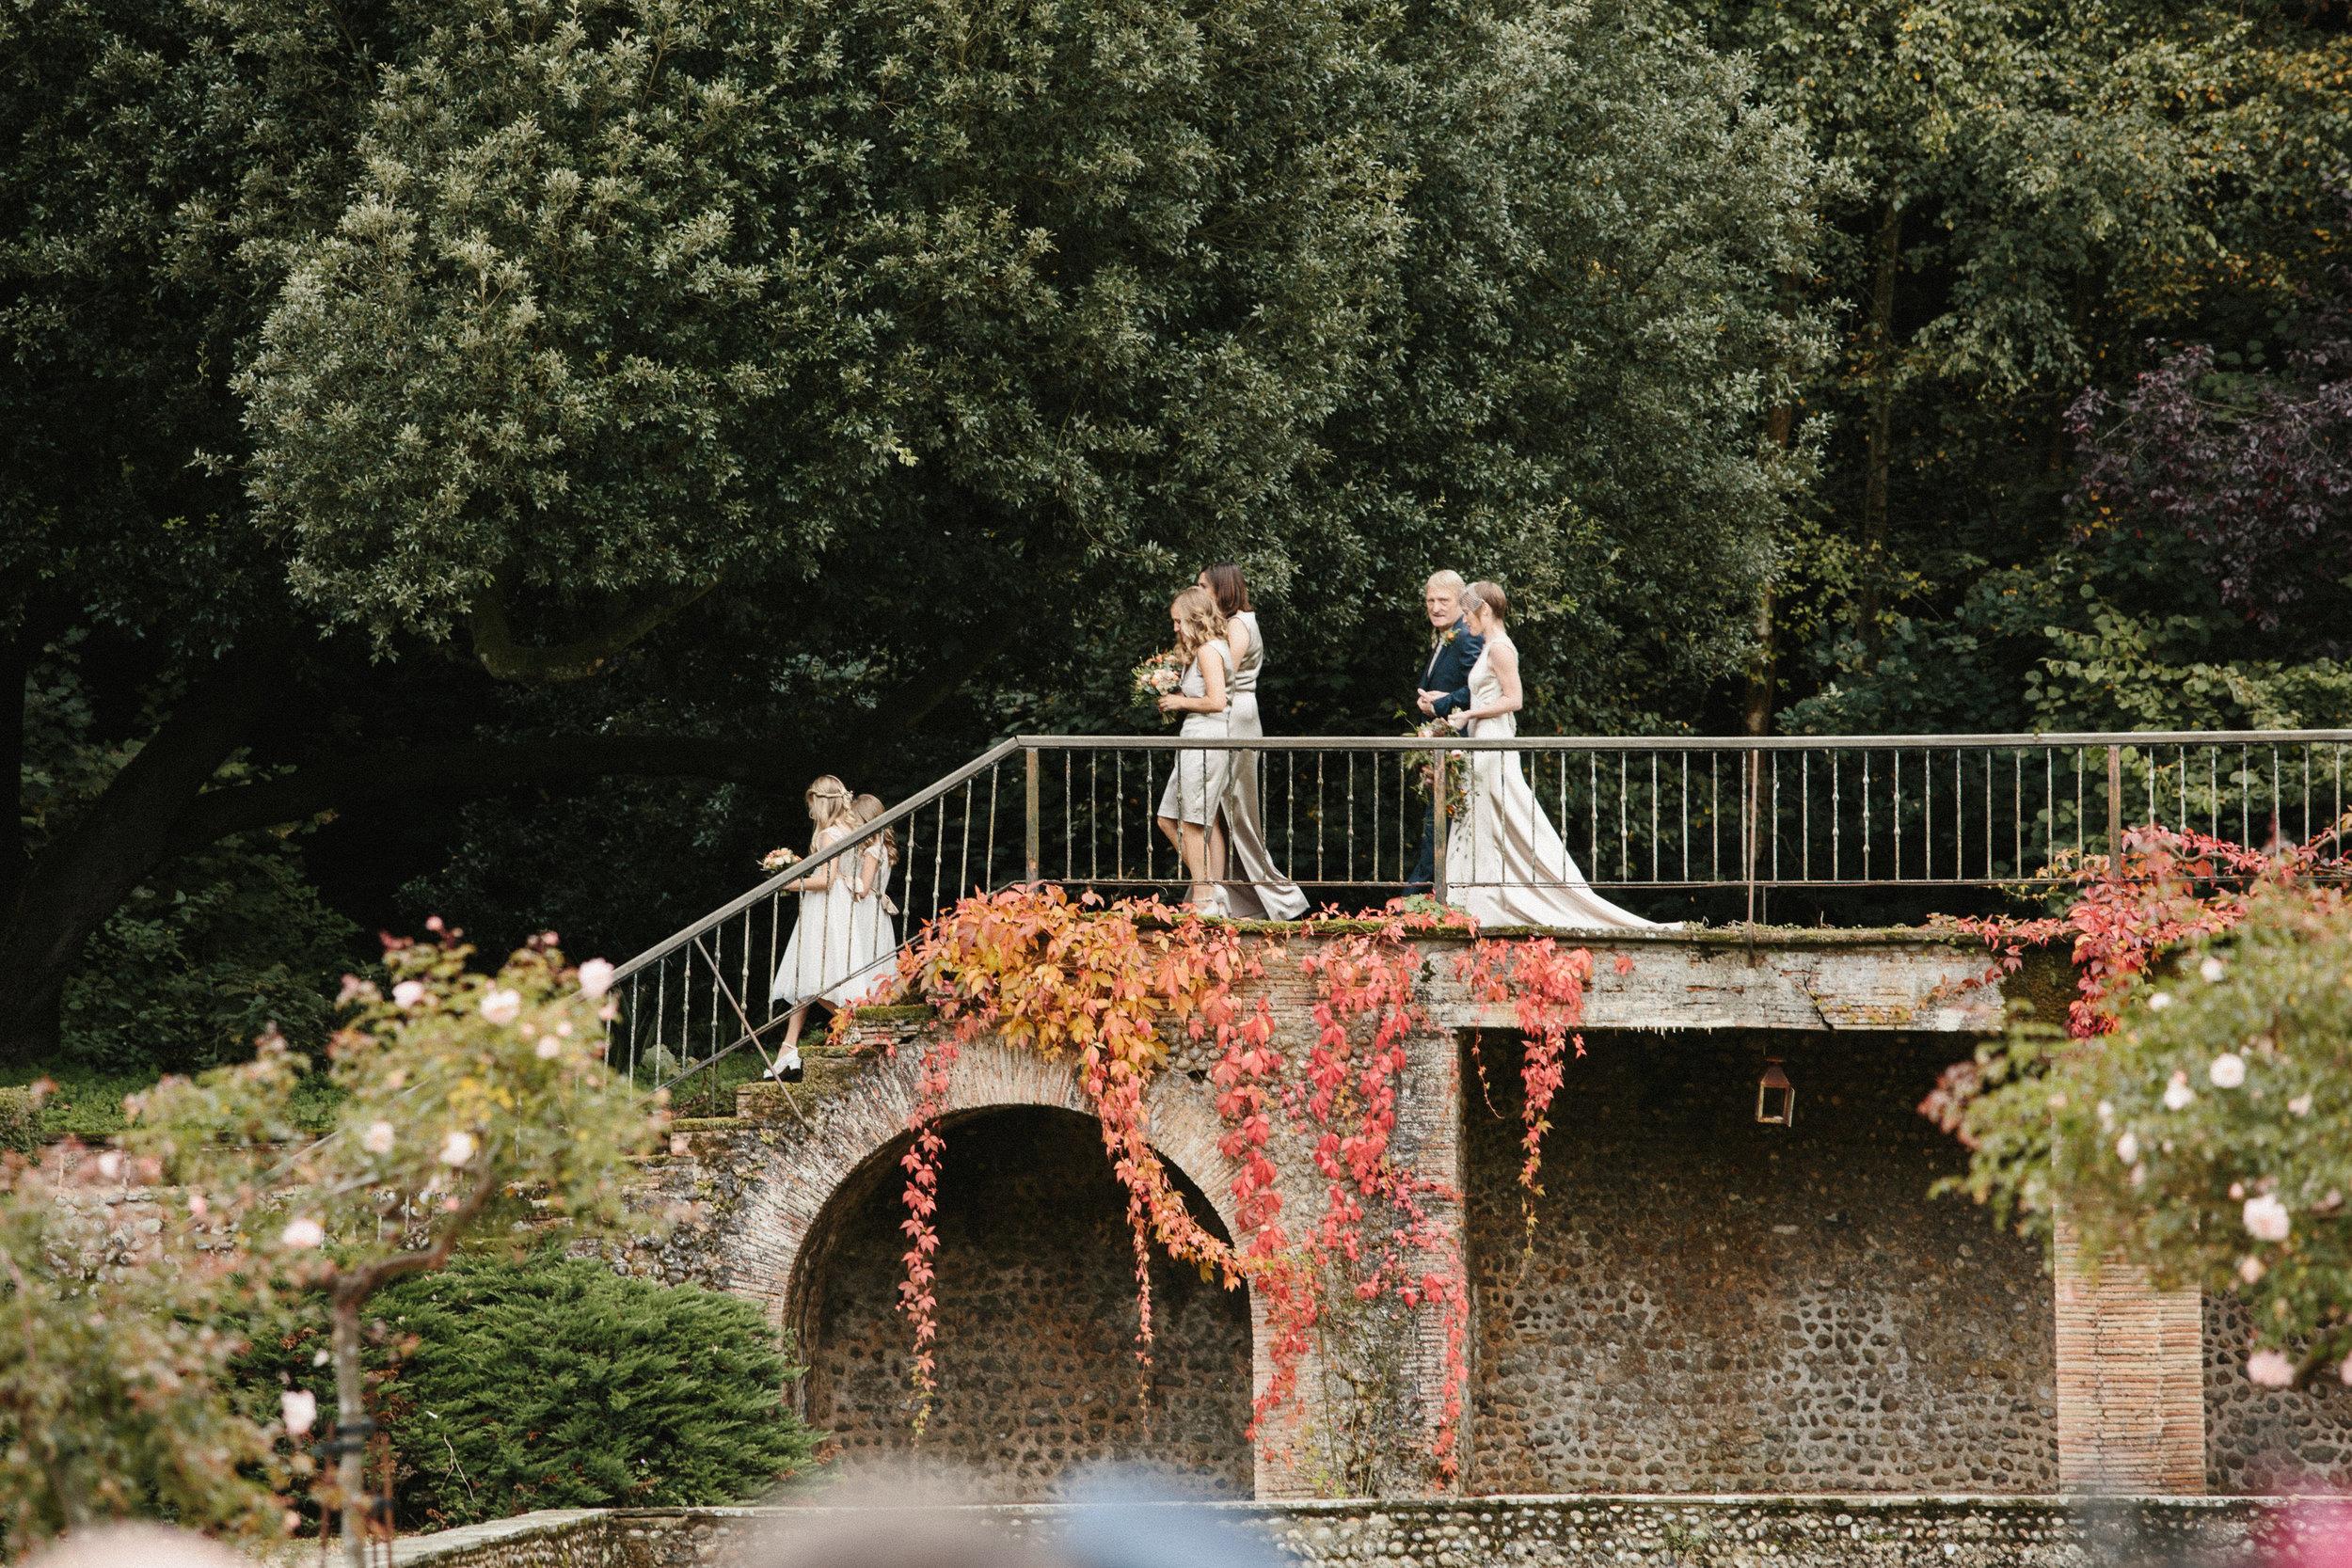 Kate-Beaumont-Sheffield-Honeysuckle-bias-cut-wedding-dress-oyster-Rosie4.jpg